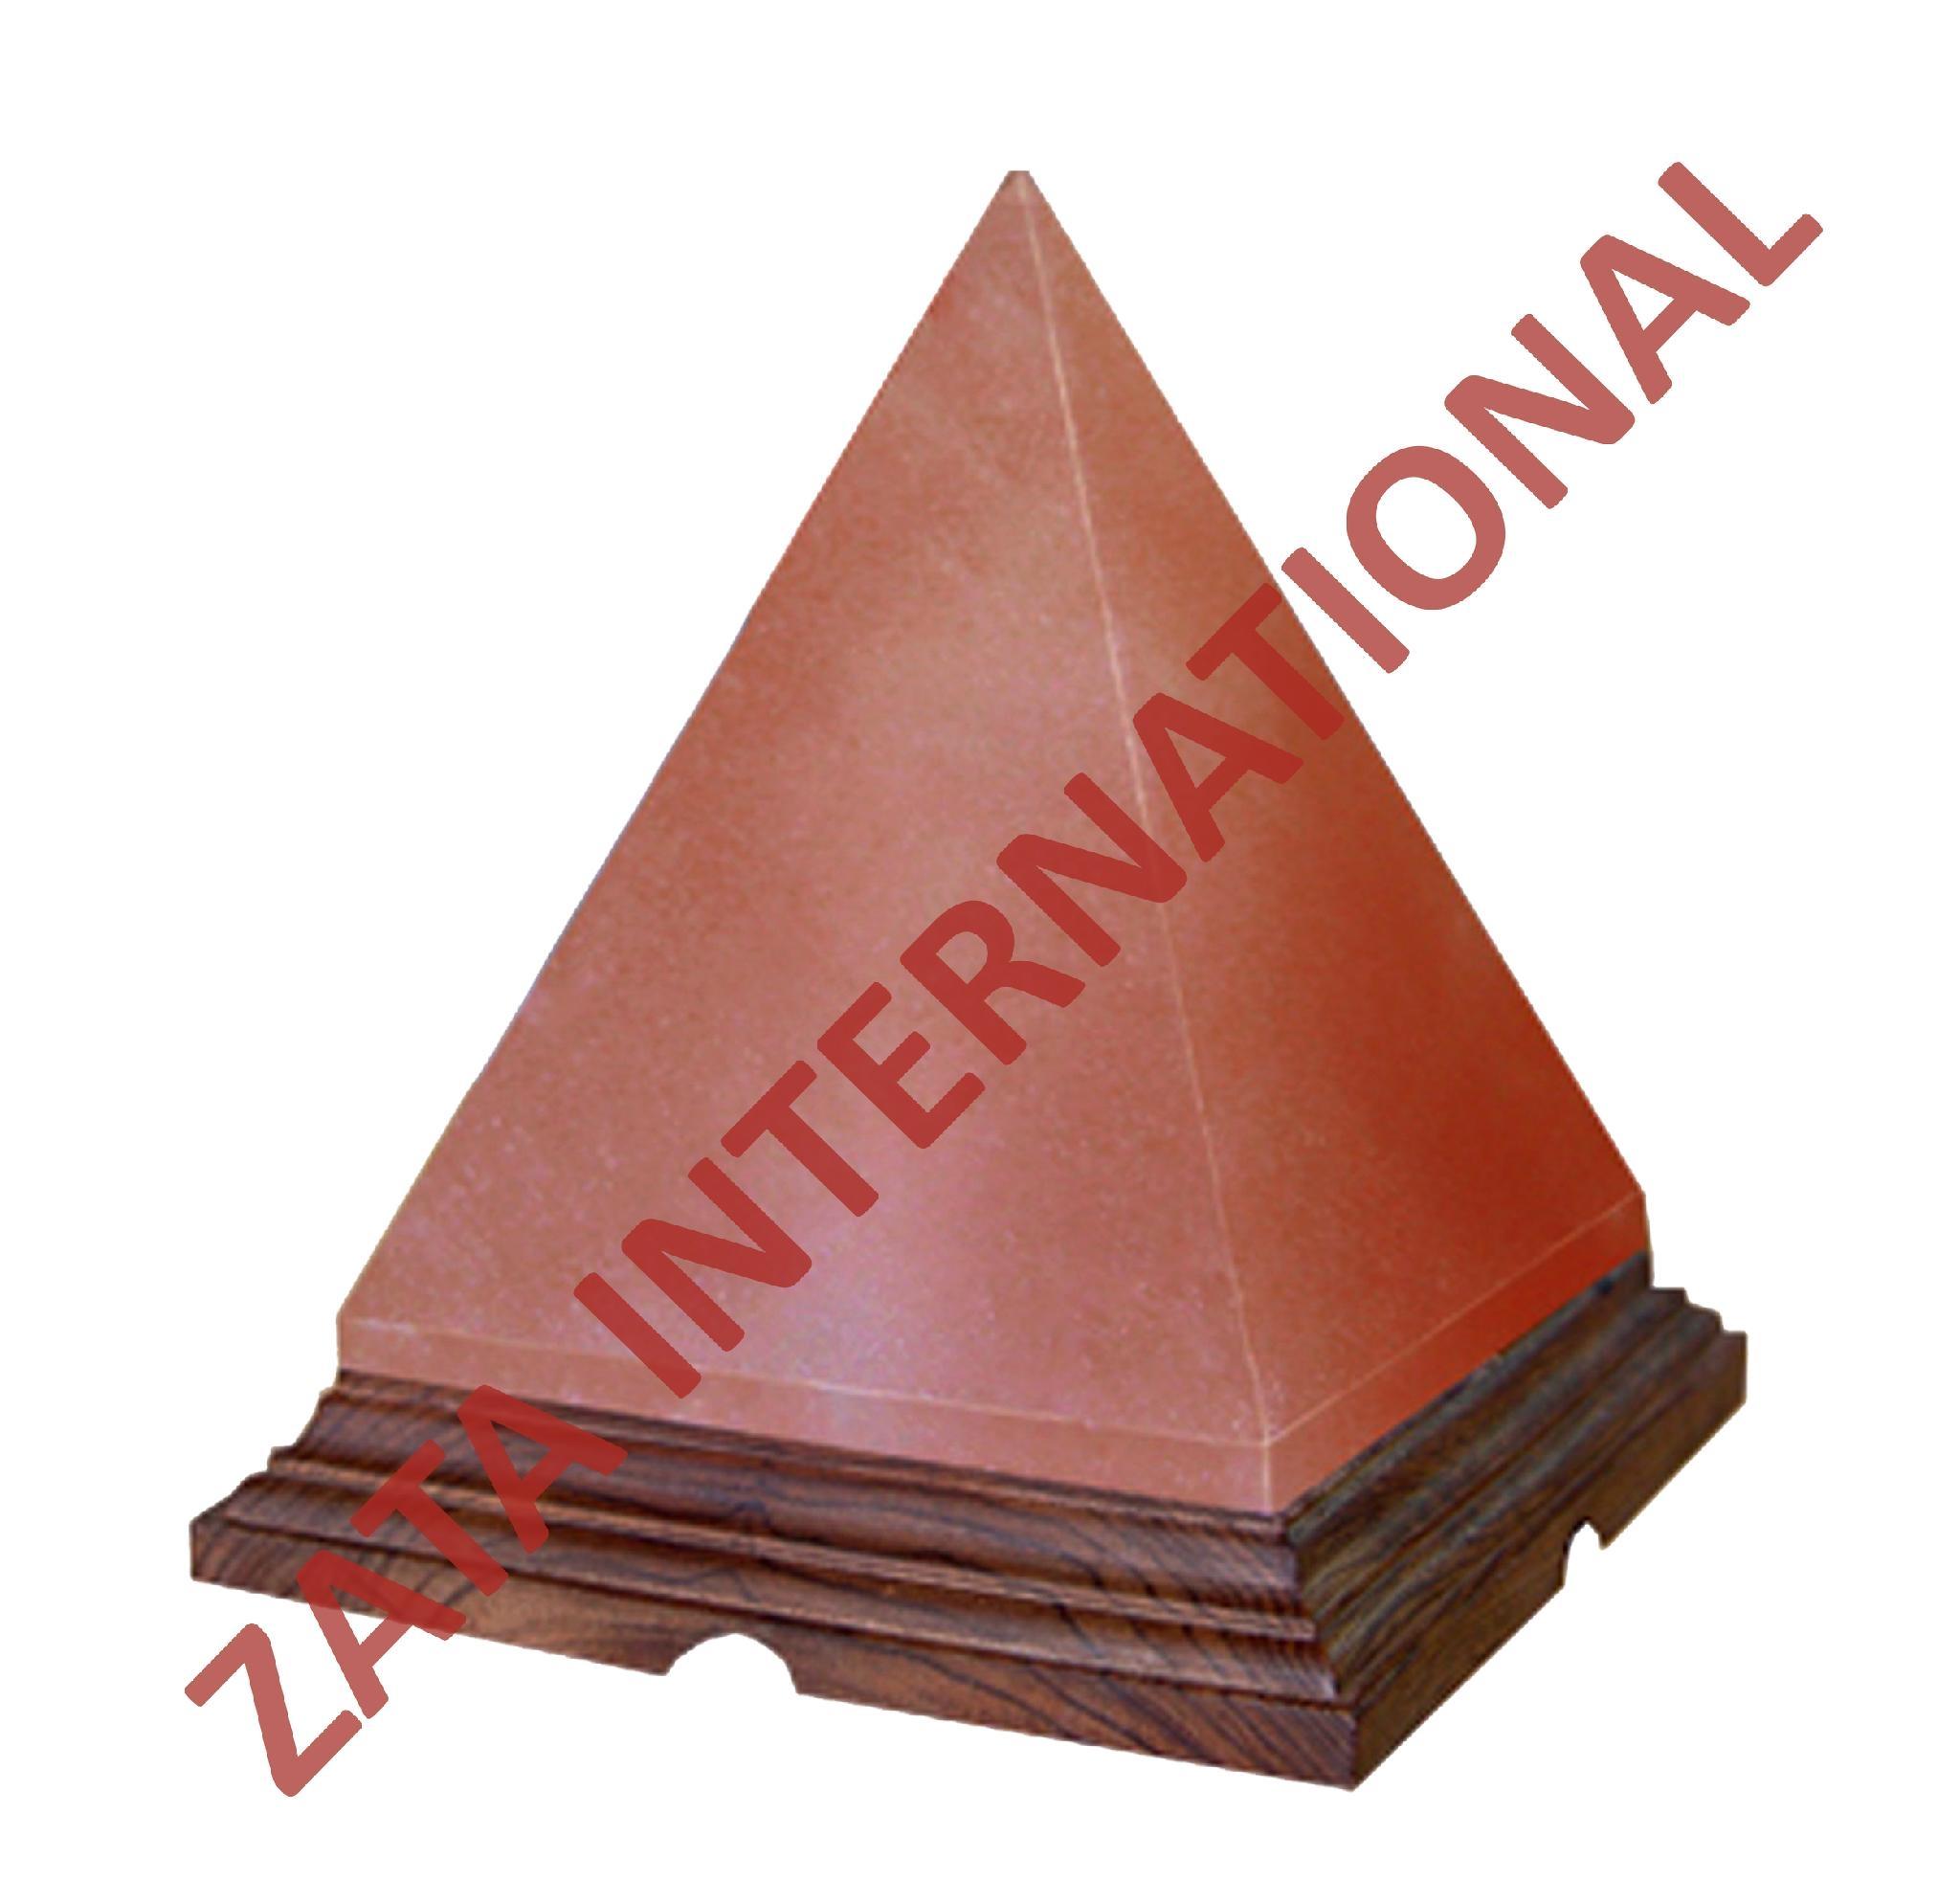 Himalayan Rock Pyramid Salt Lamps 6 x 5 x 5 Inches 6 Feets Cord Bulb w Base 1